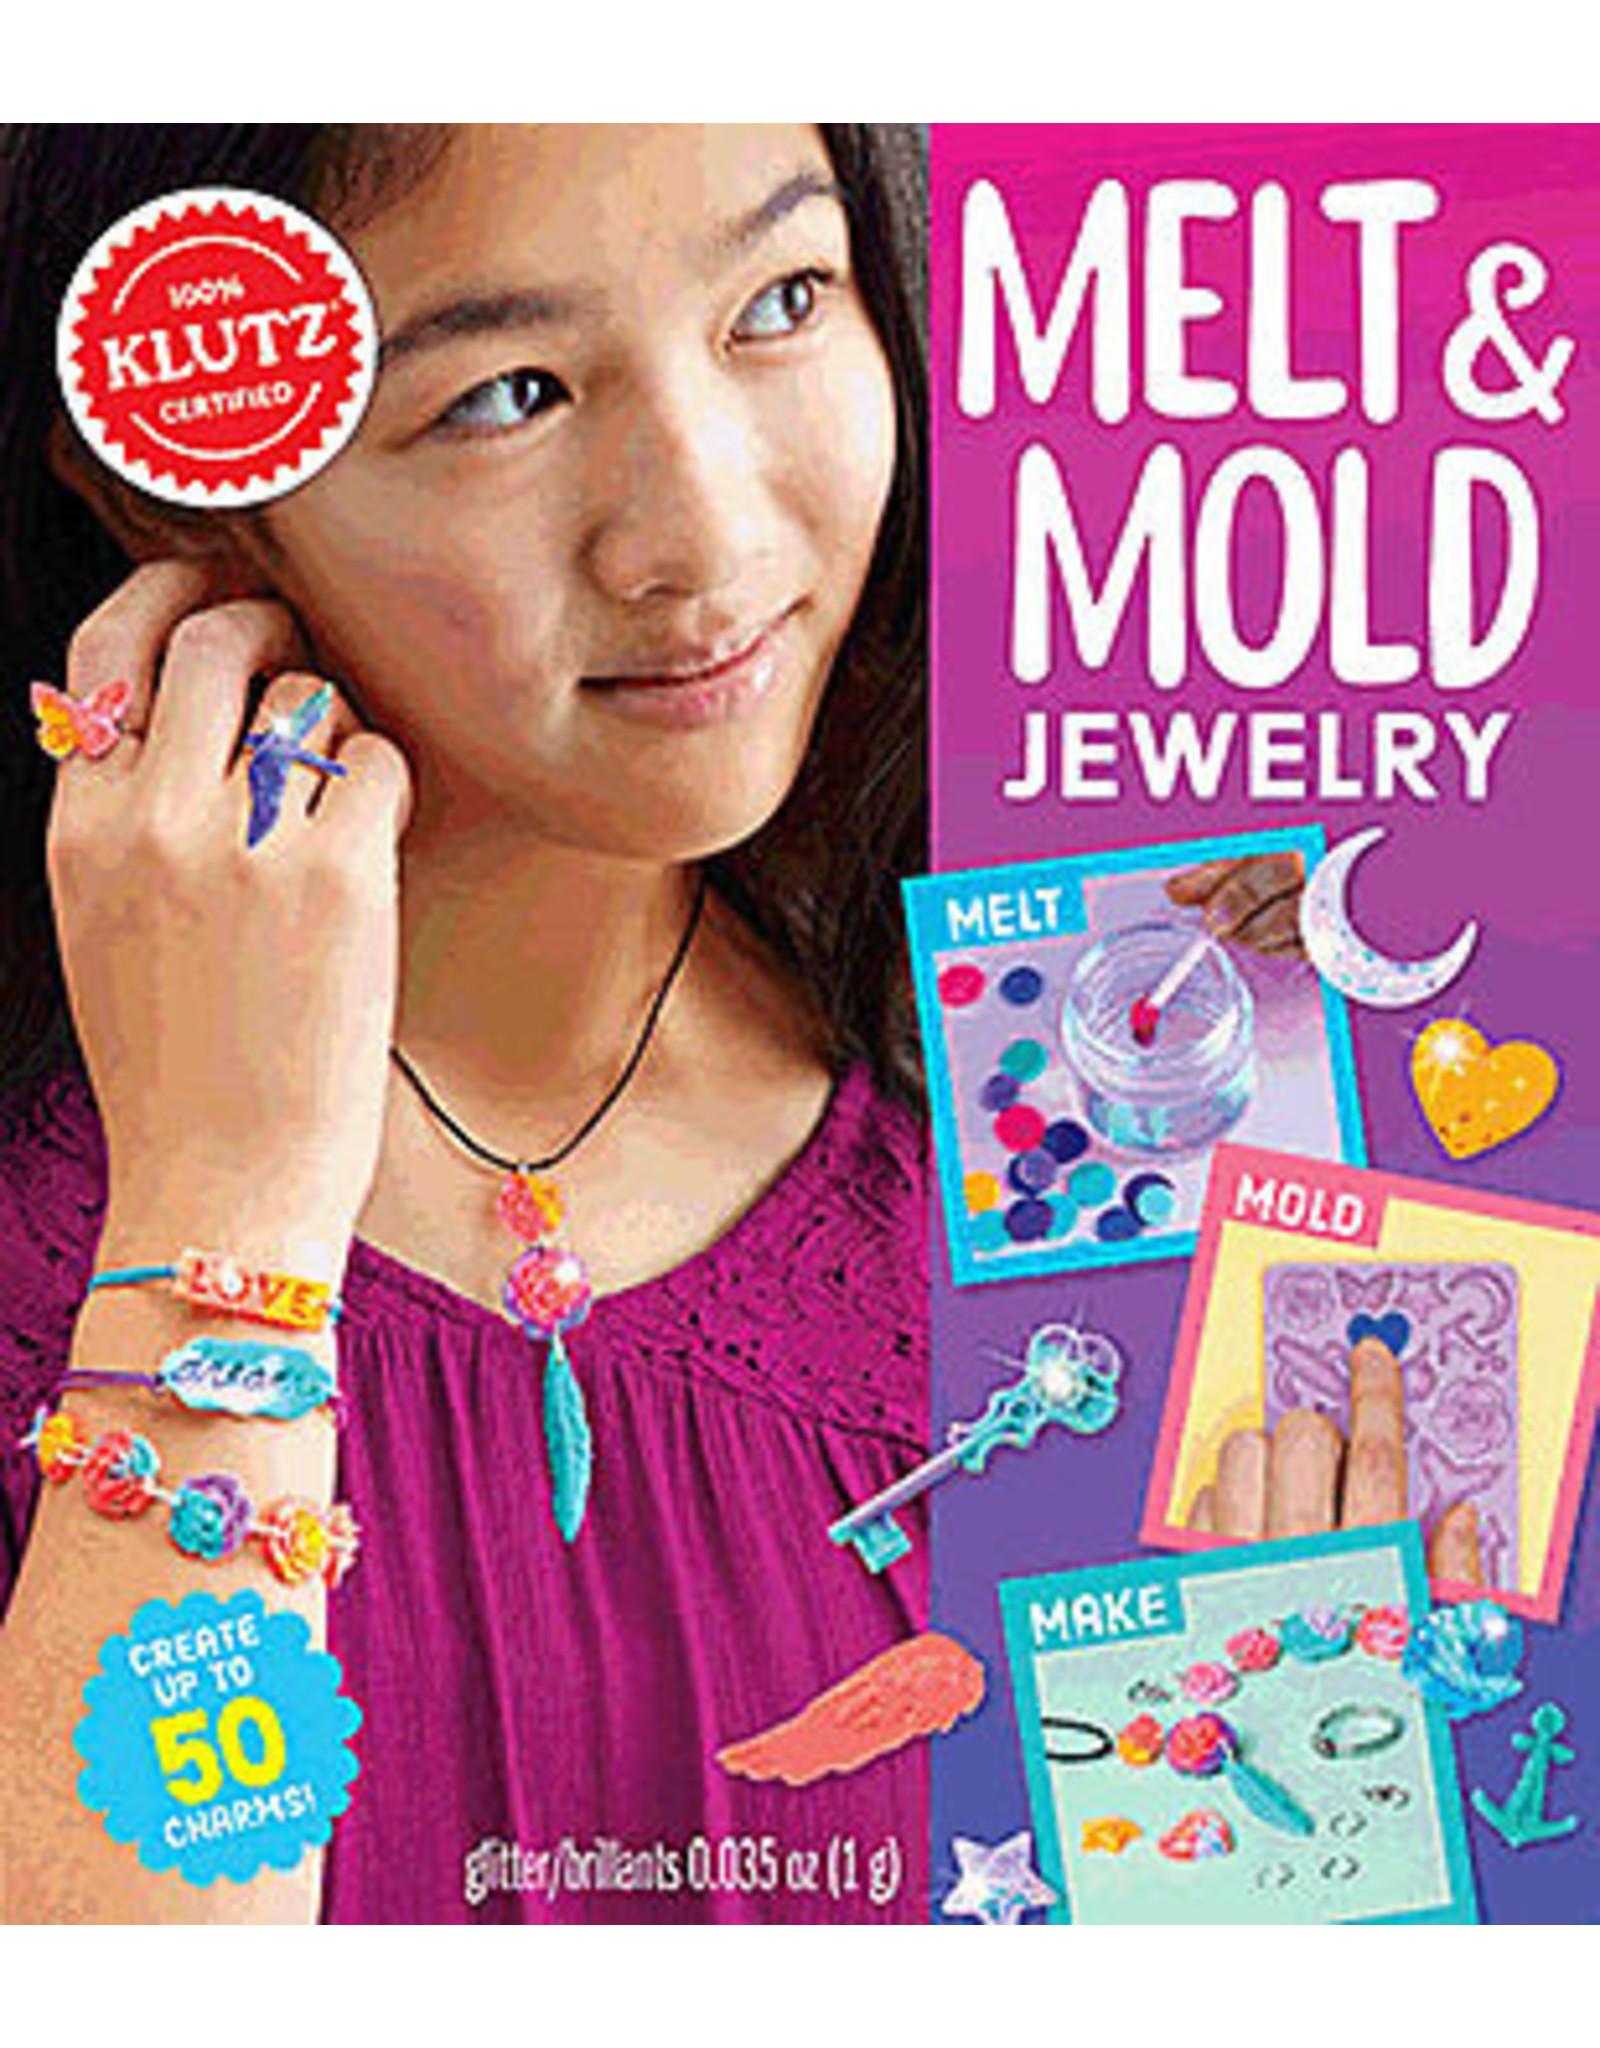 Klutz Melt & Mold Jewelry